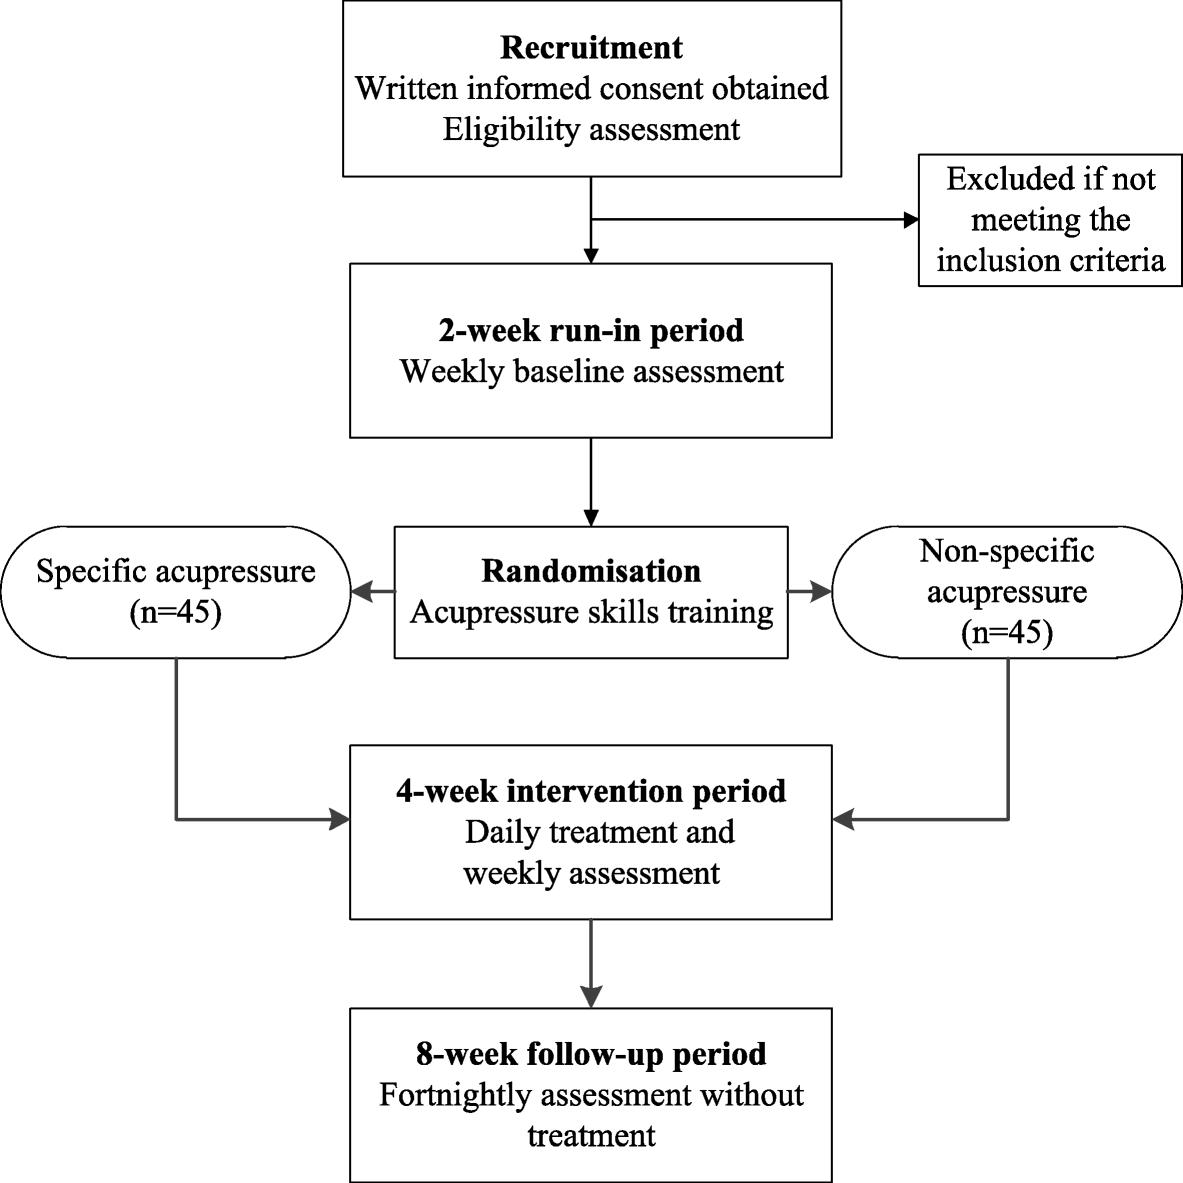 Self-administered acupressure for allergic rhinitis: study protocol